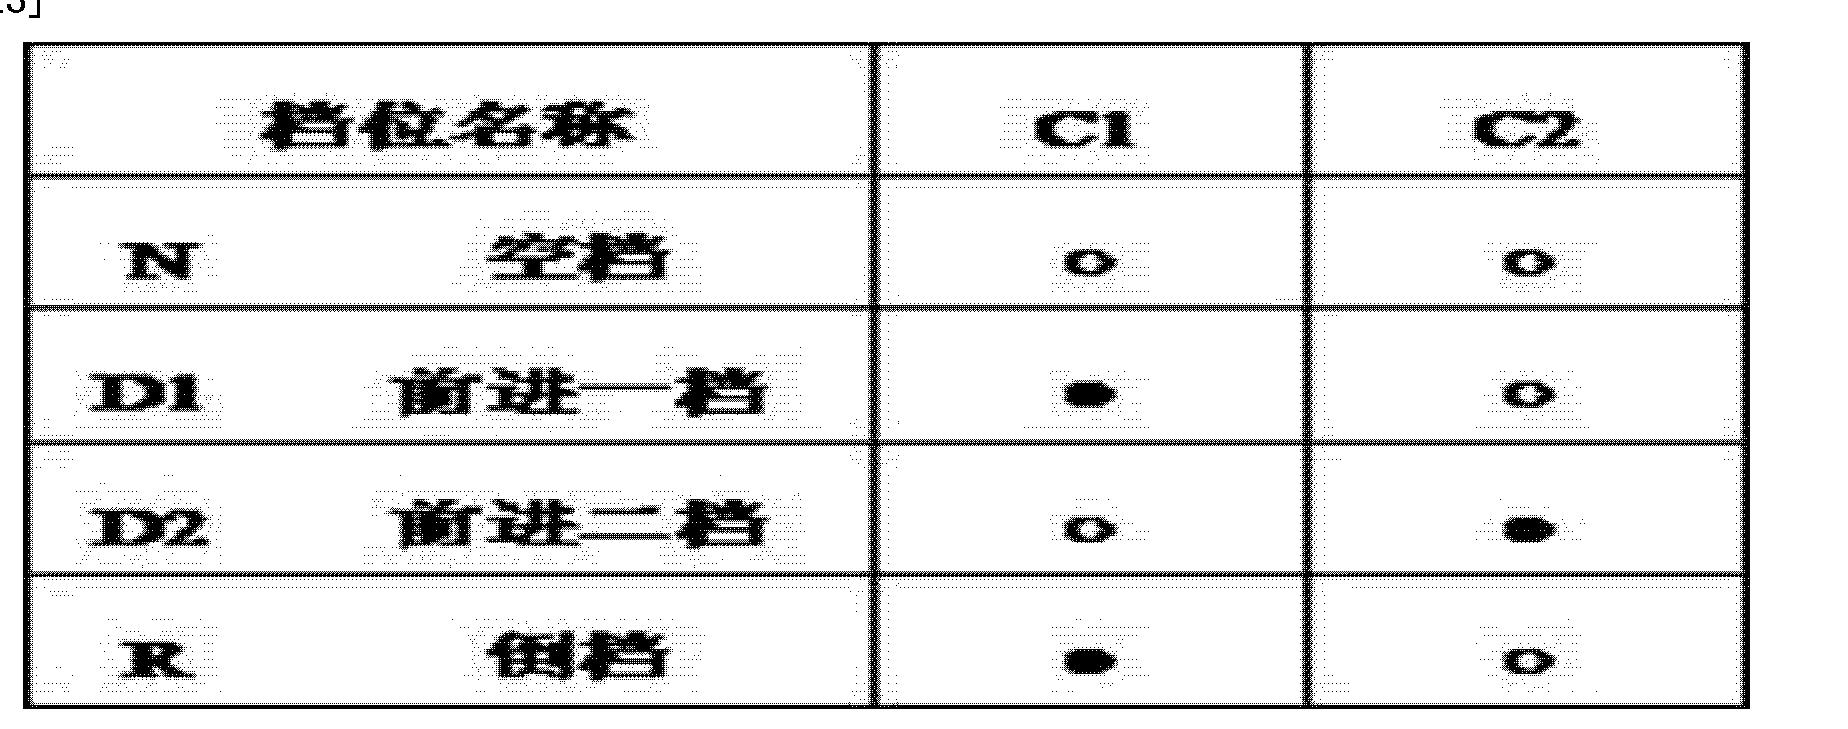 Figure CN203039496UD00042